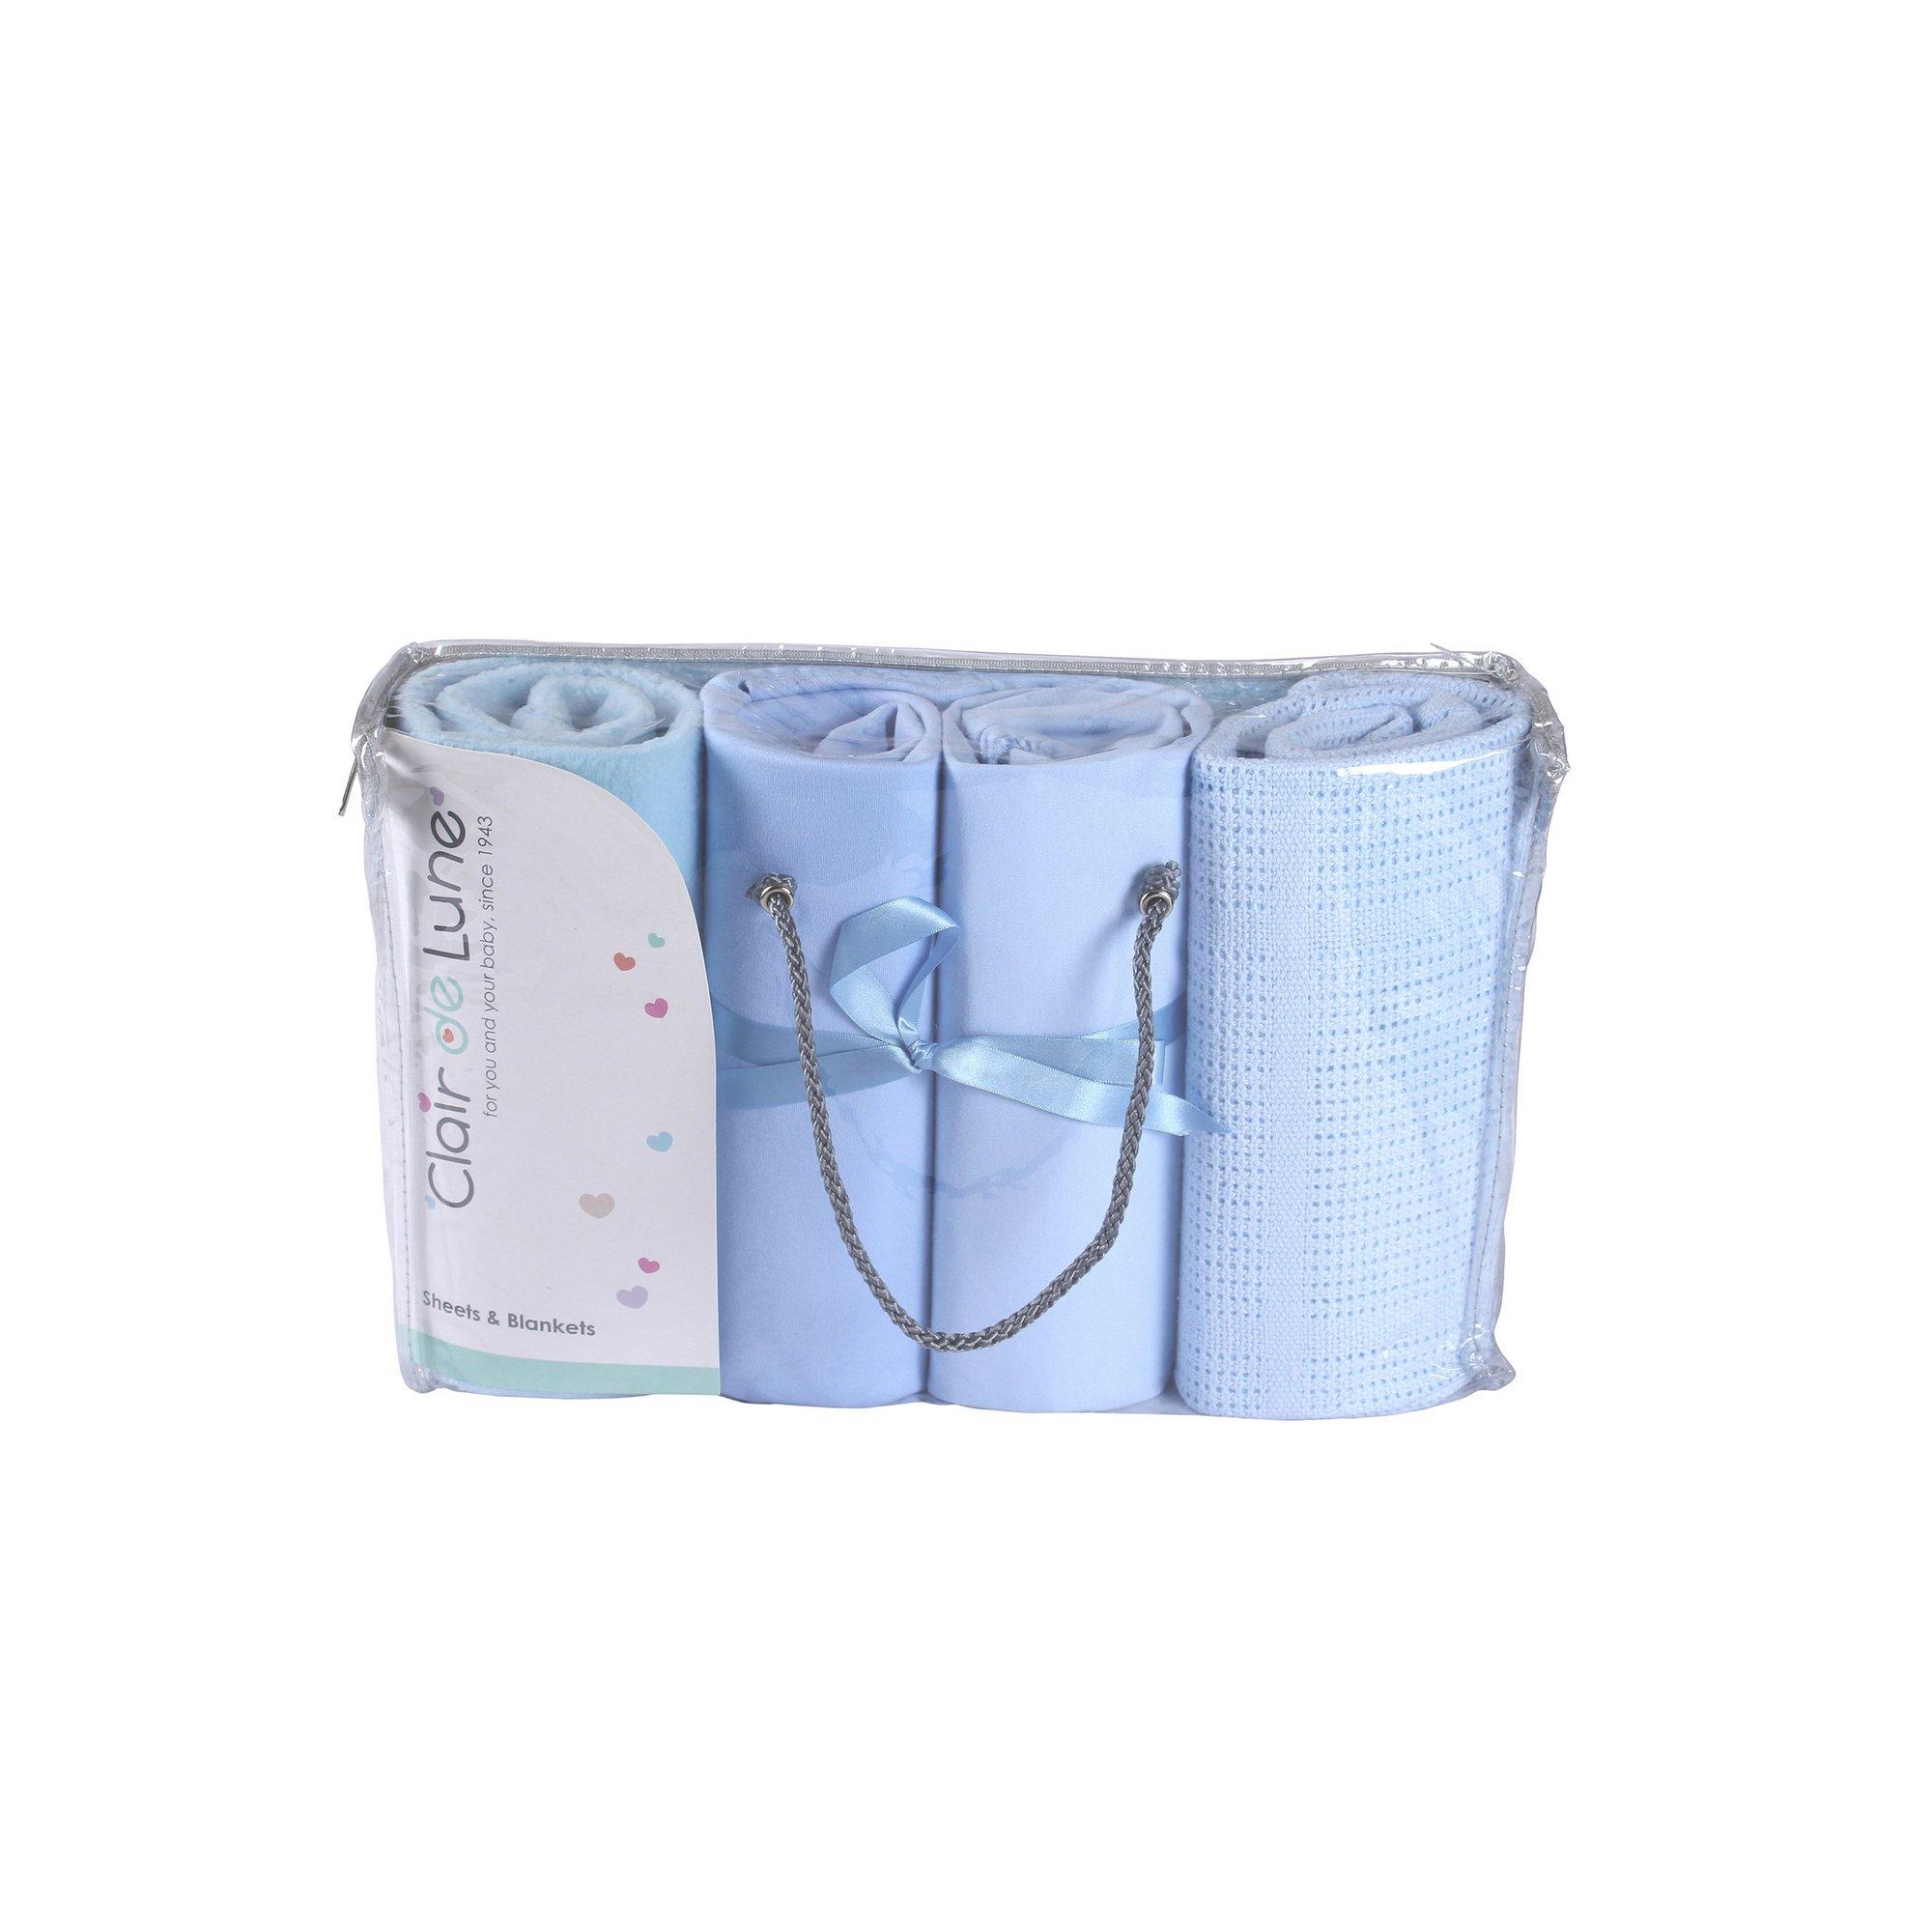 Image of Clair de Lune 4 Piece Moses Basket Bedding Bale Gift Set